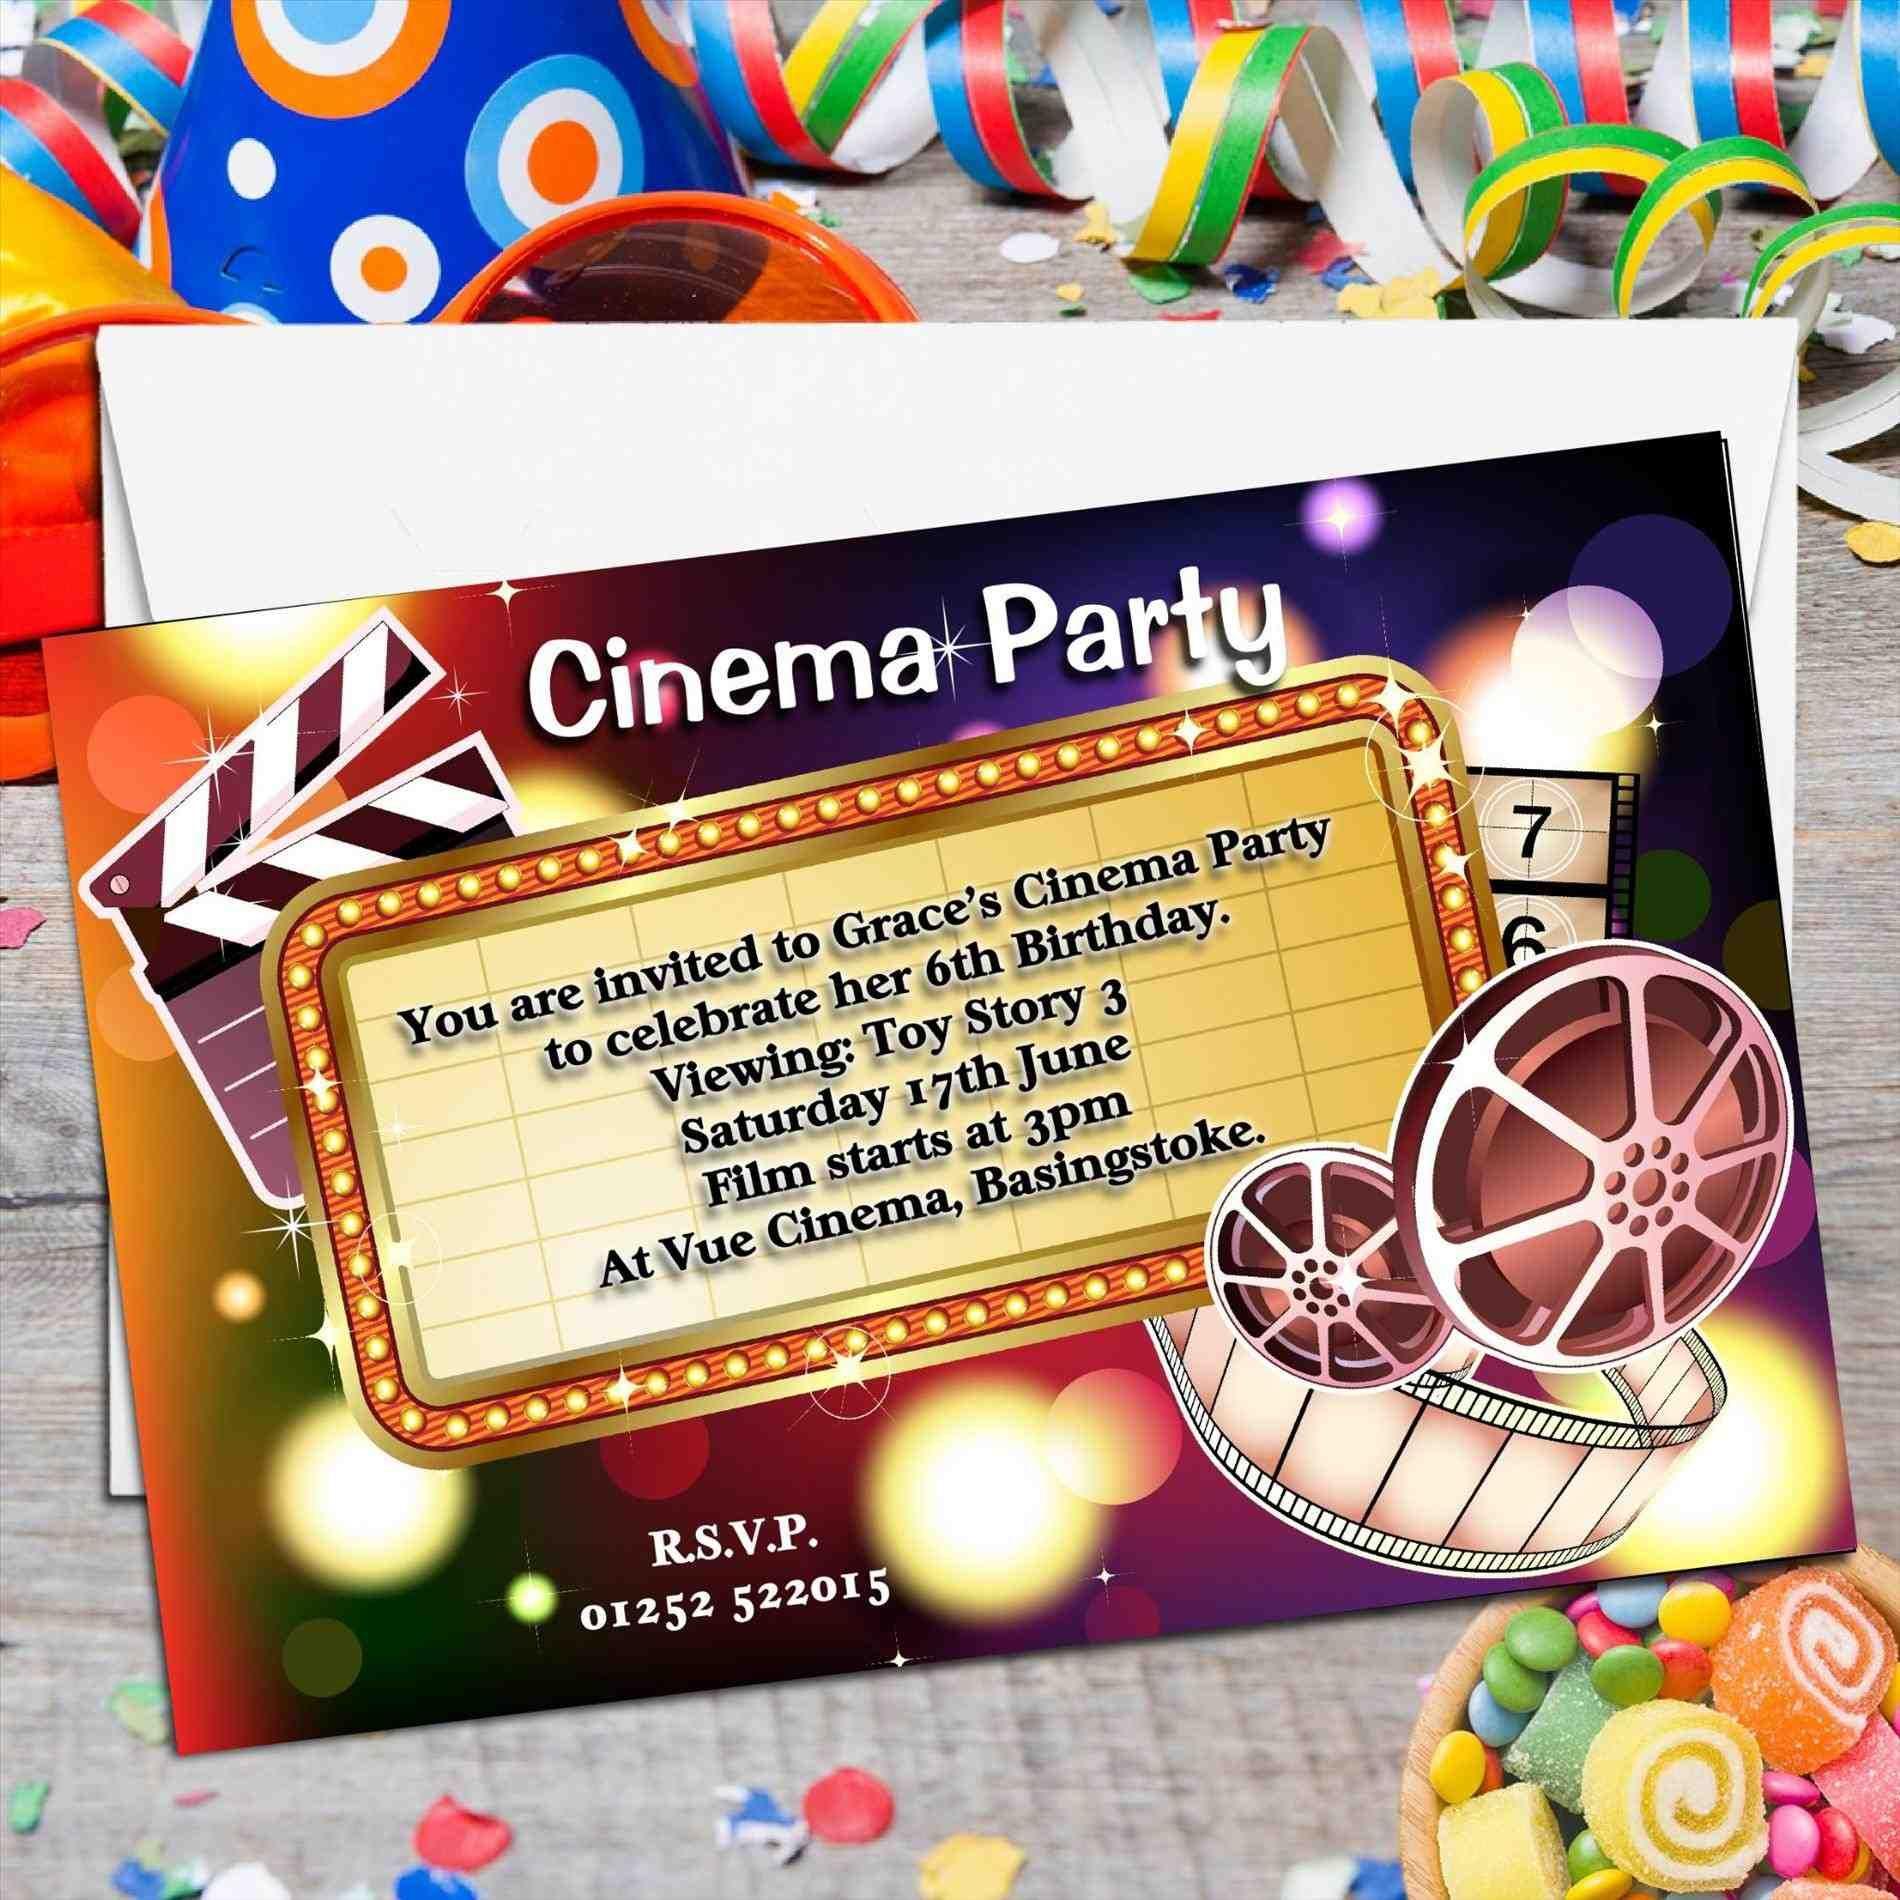 birthday party invitation templates free printable%0A                  movie theater birthday party    movie birthday party  invitation by swankypress on etsy         skating party invitation template